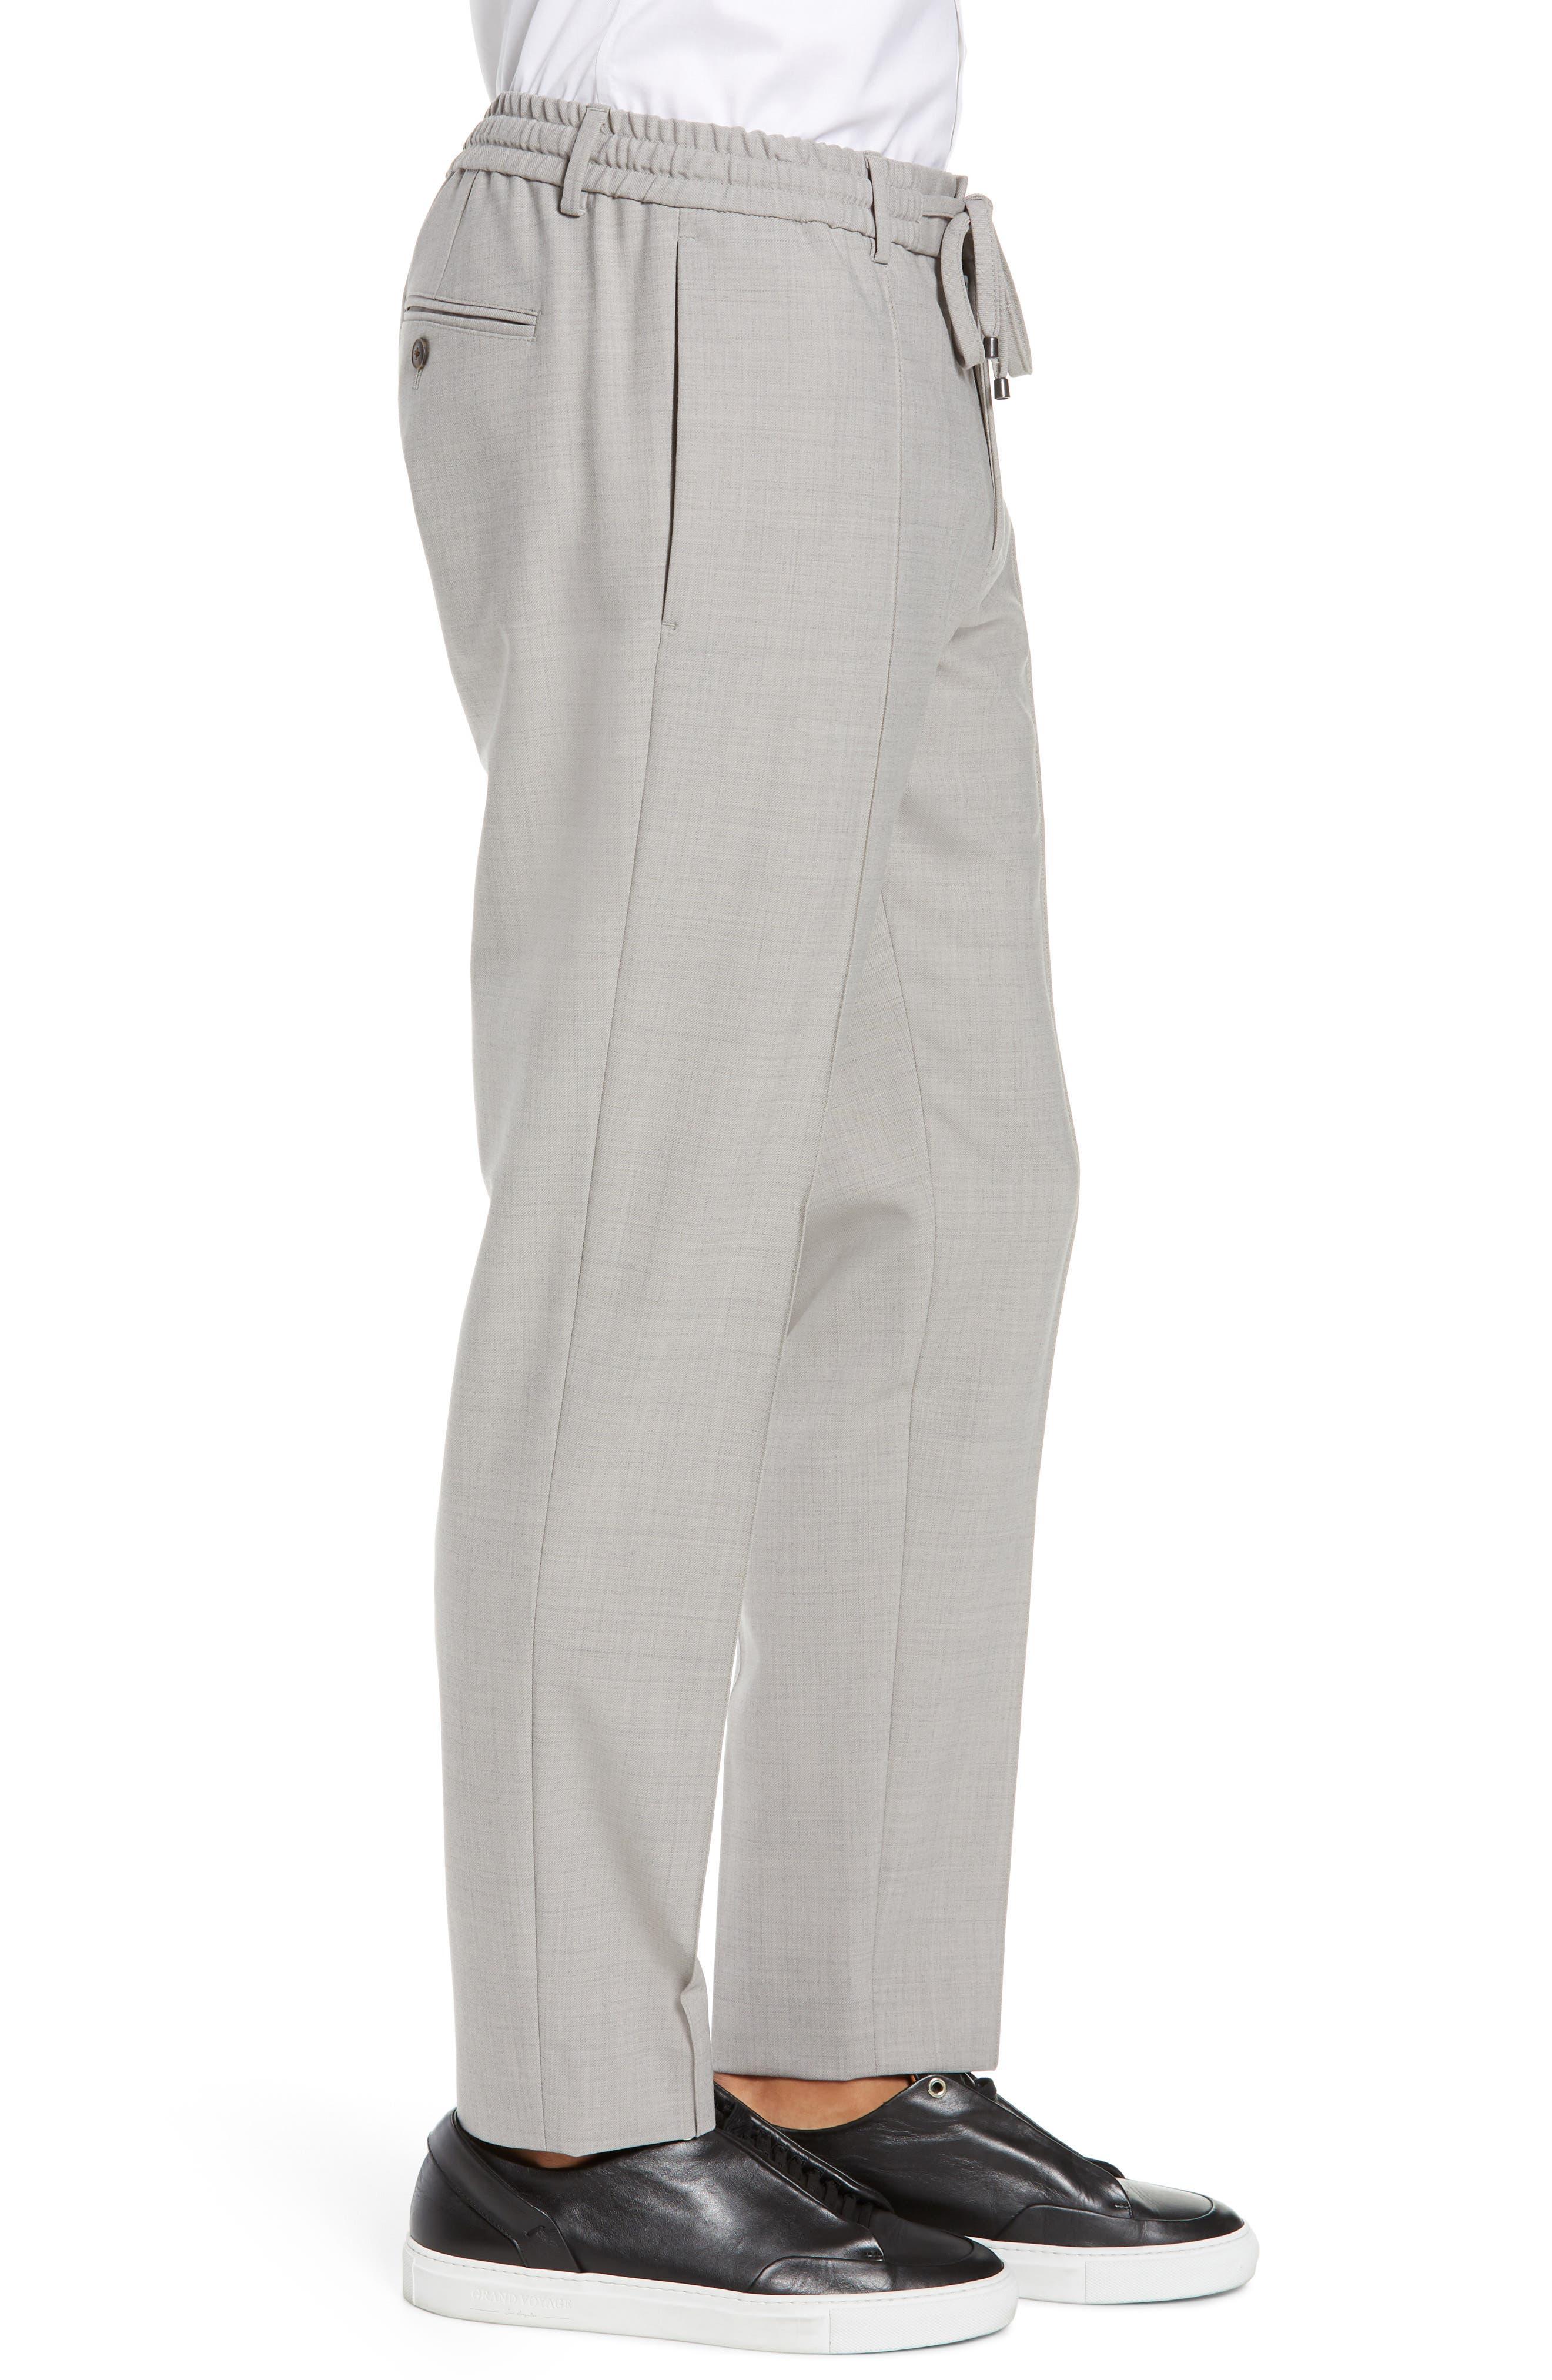 CLUB MONACO,                             Trim Fit Pintuck Pants,                             Alternate thumbnail 3, color,                             HEATHER GREY